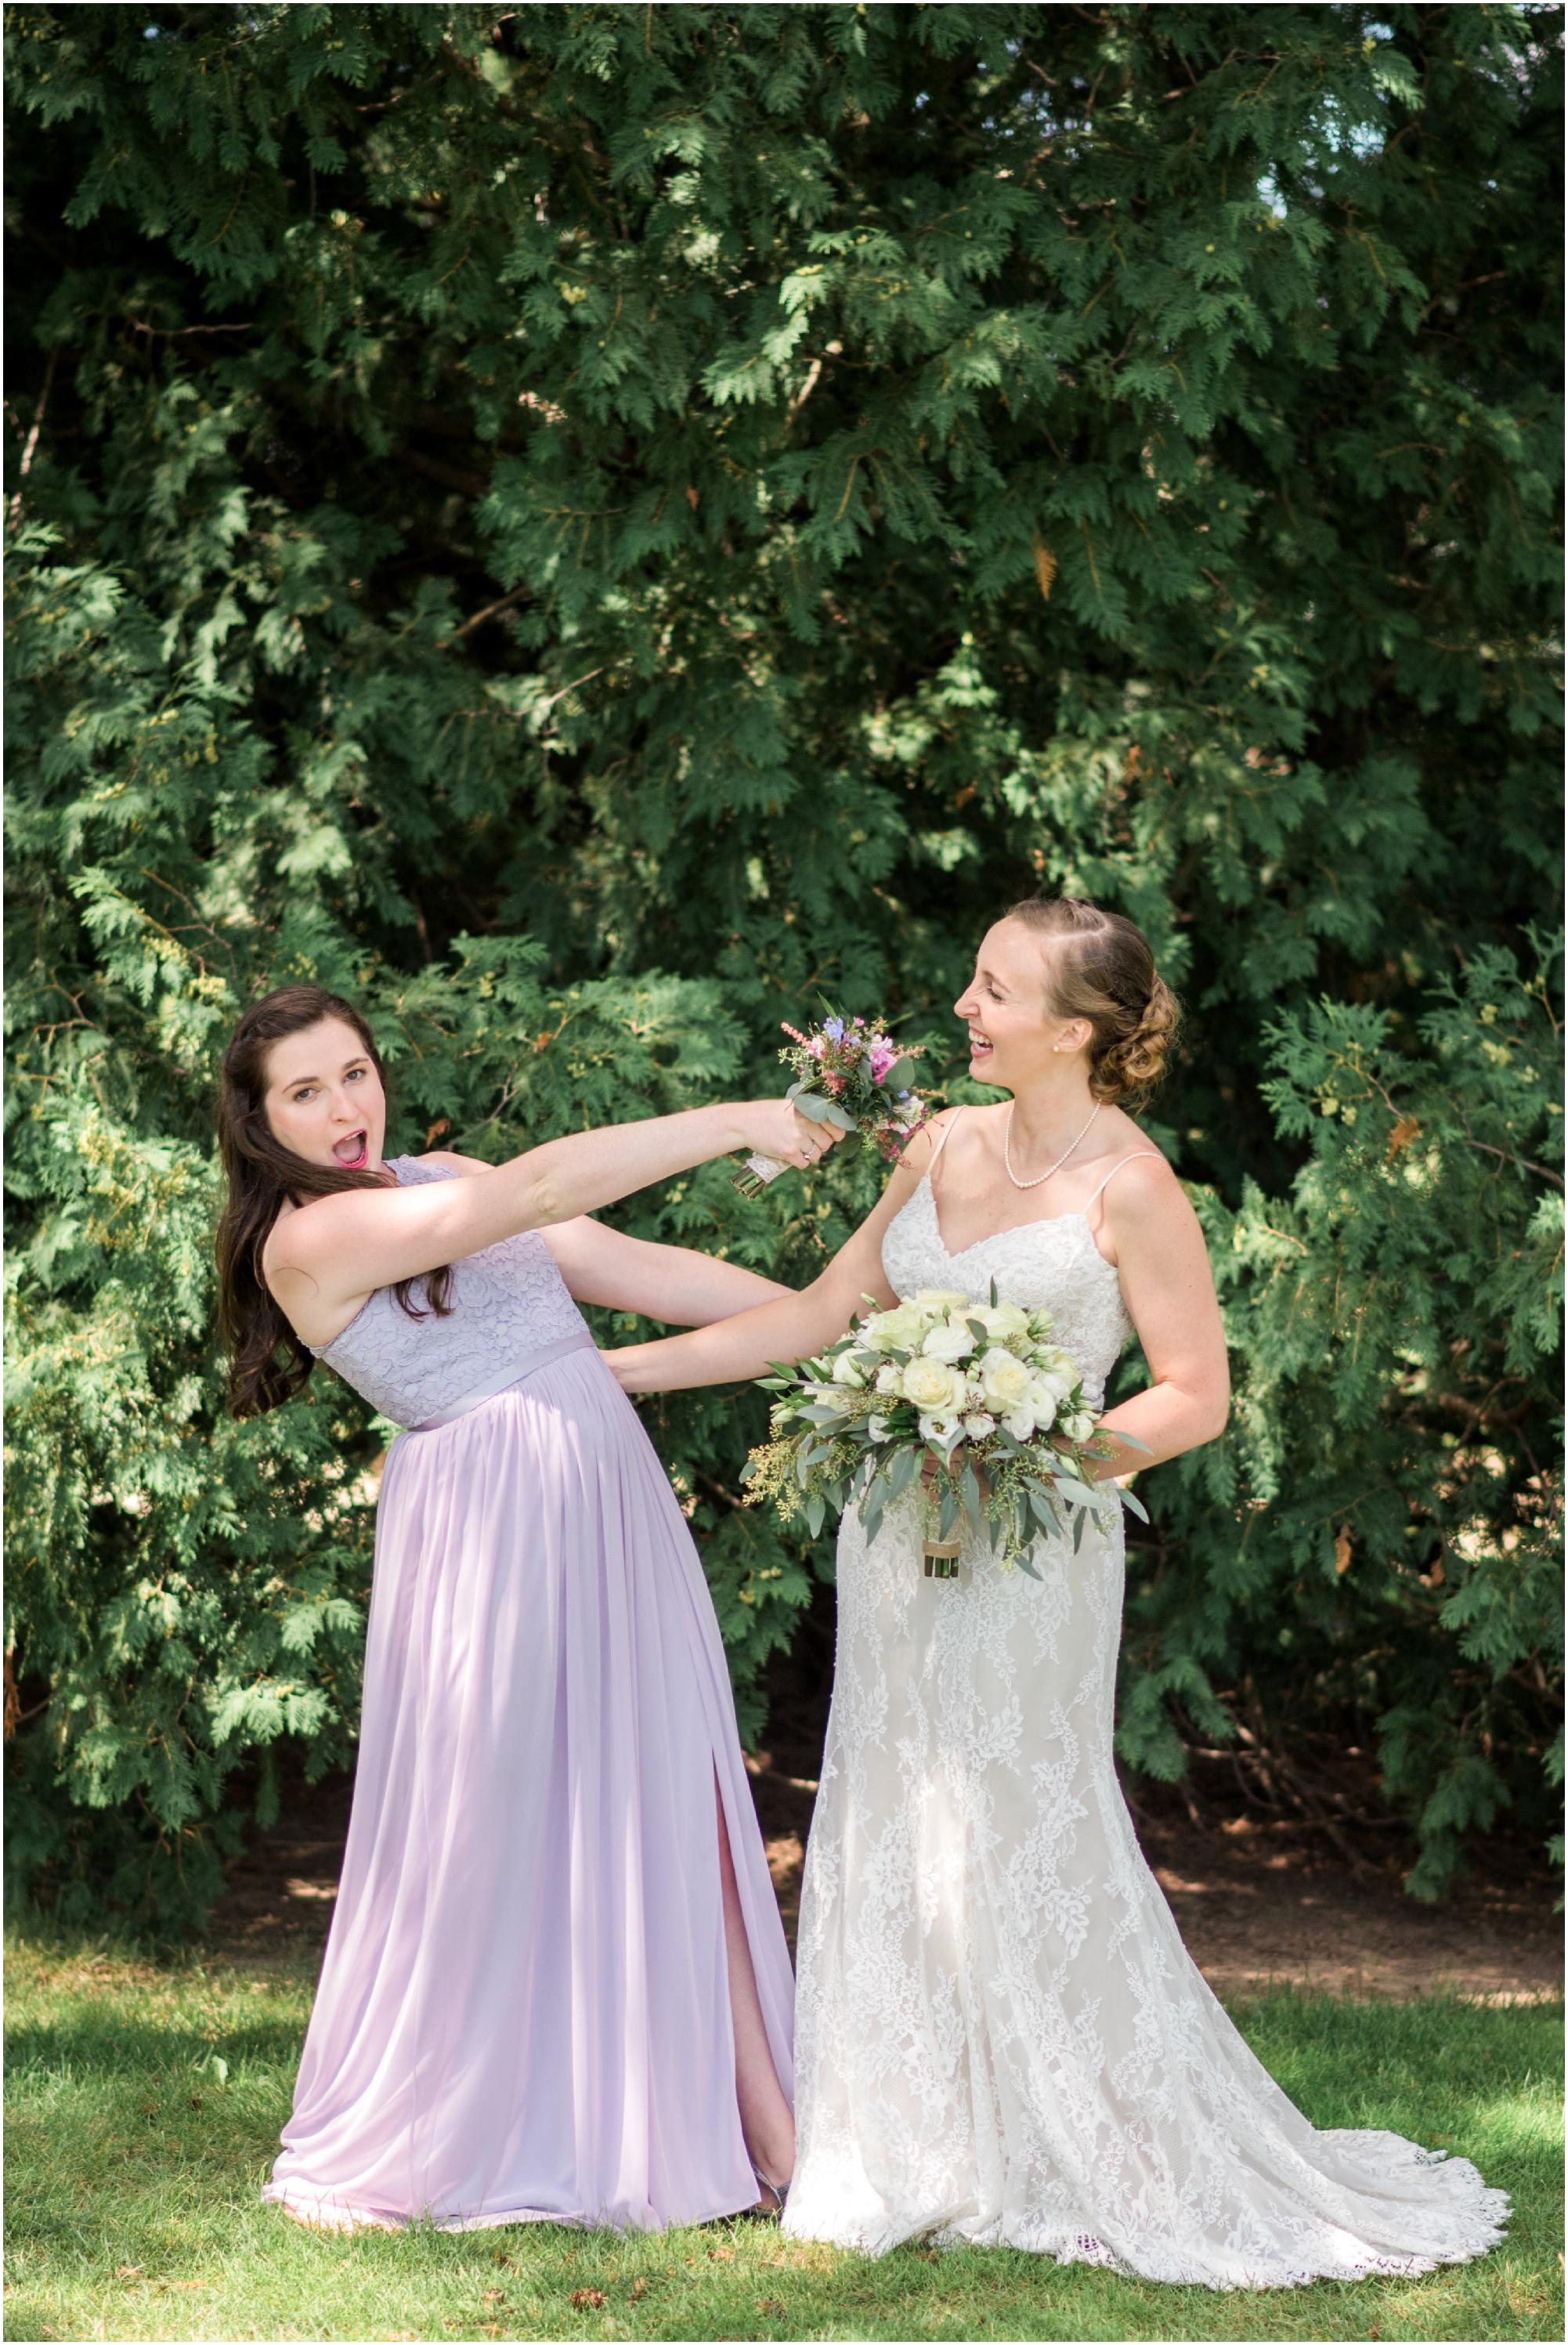 Wisconsin-Wedding-Photographer-Reedsburg-Country-Club-Kaela-and Matt-Wedding-166.jpg